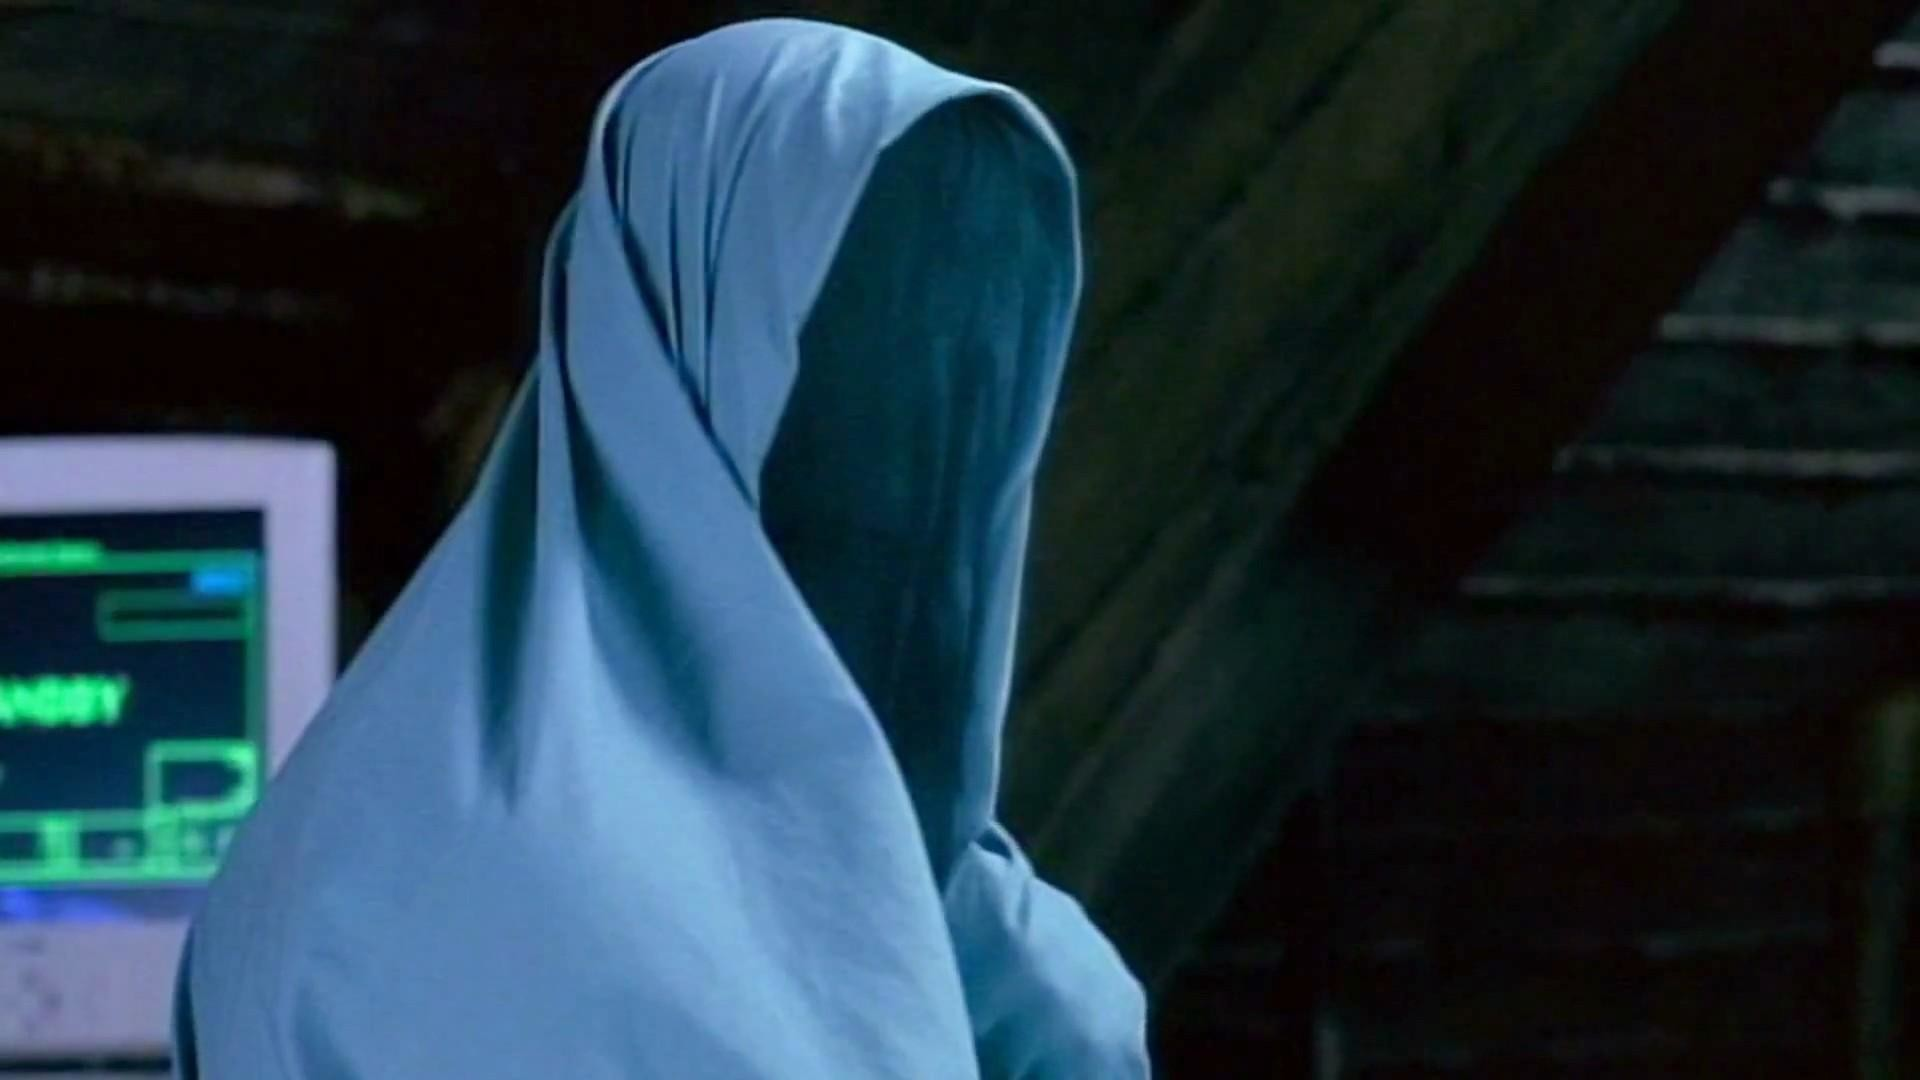 <p>Кадр фильма &ldquo;Человек невидимка&rdquo;. Скриншот &copy; L!FE</p>